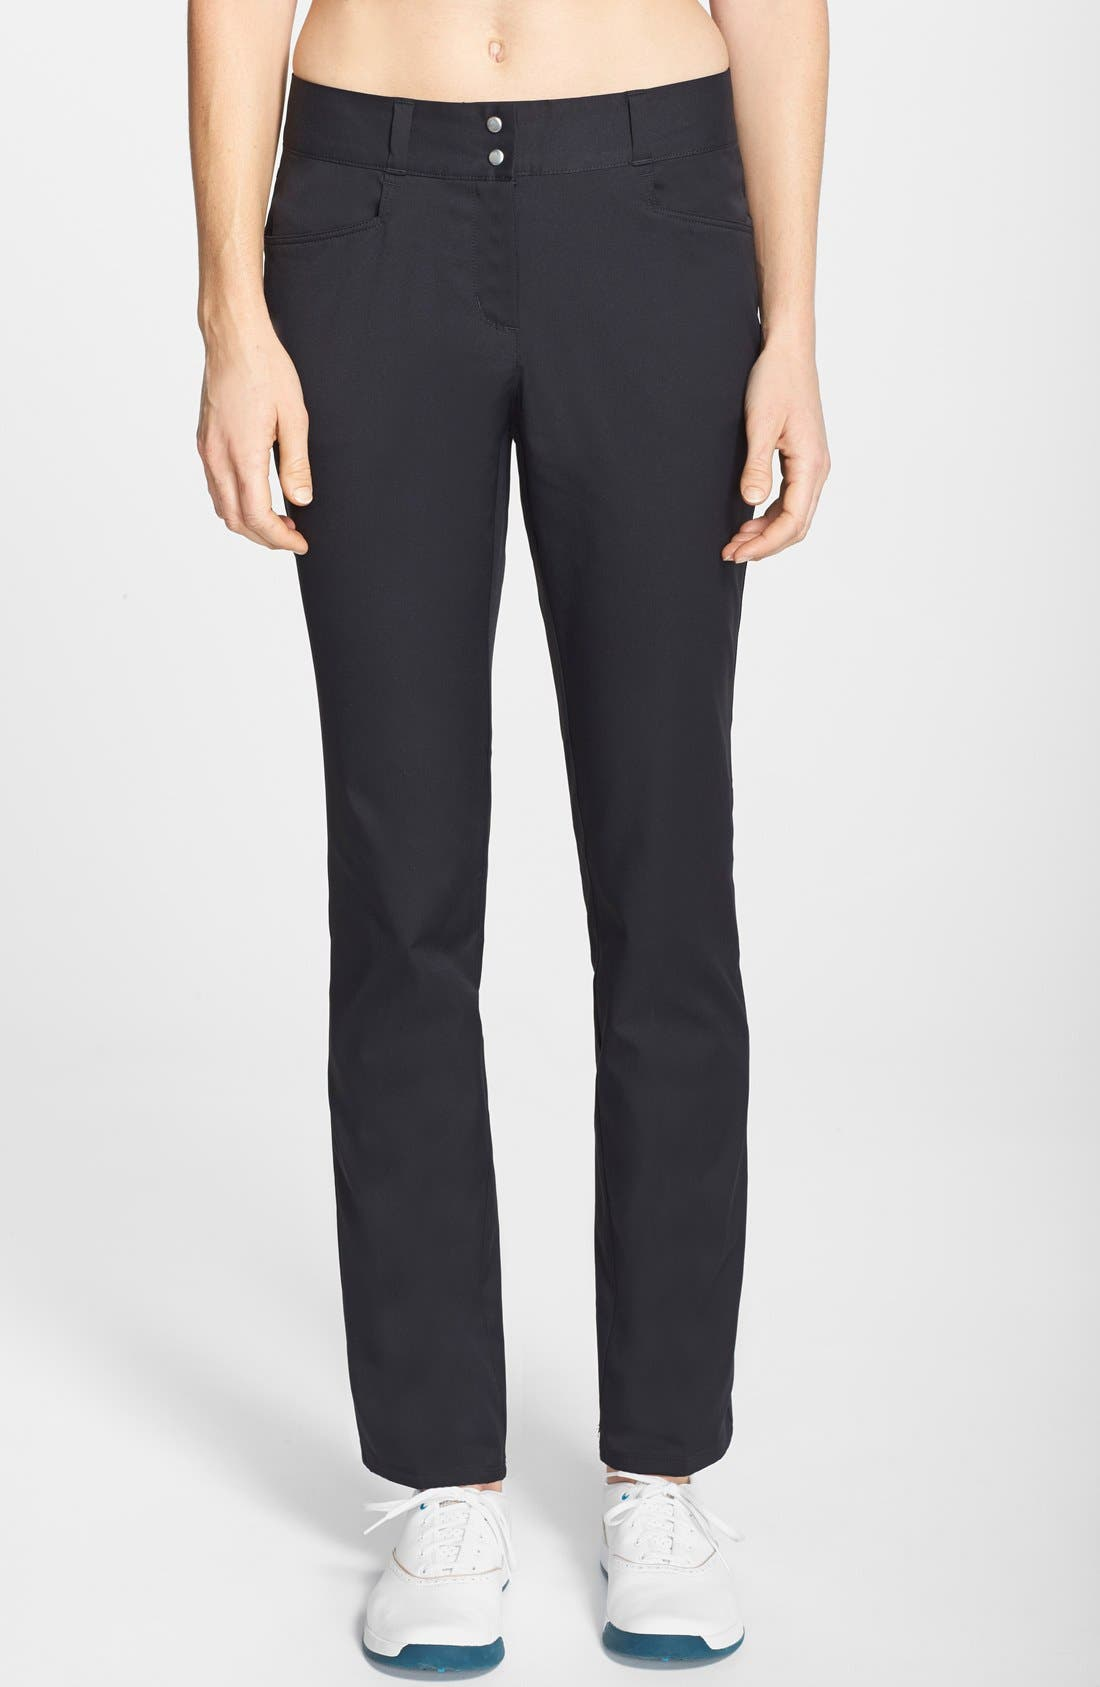 Alternate Image 1 Selected - adidas Lightweight Regular Fit Golf Pants